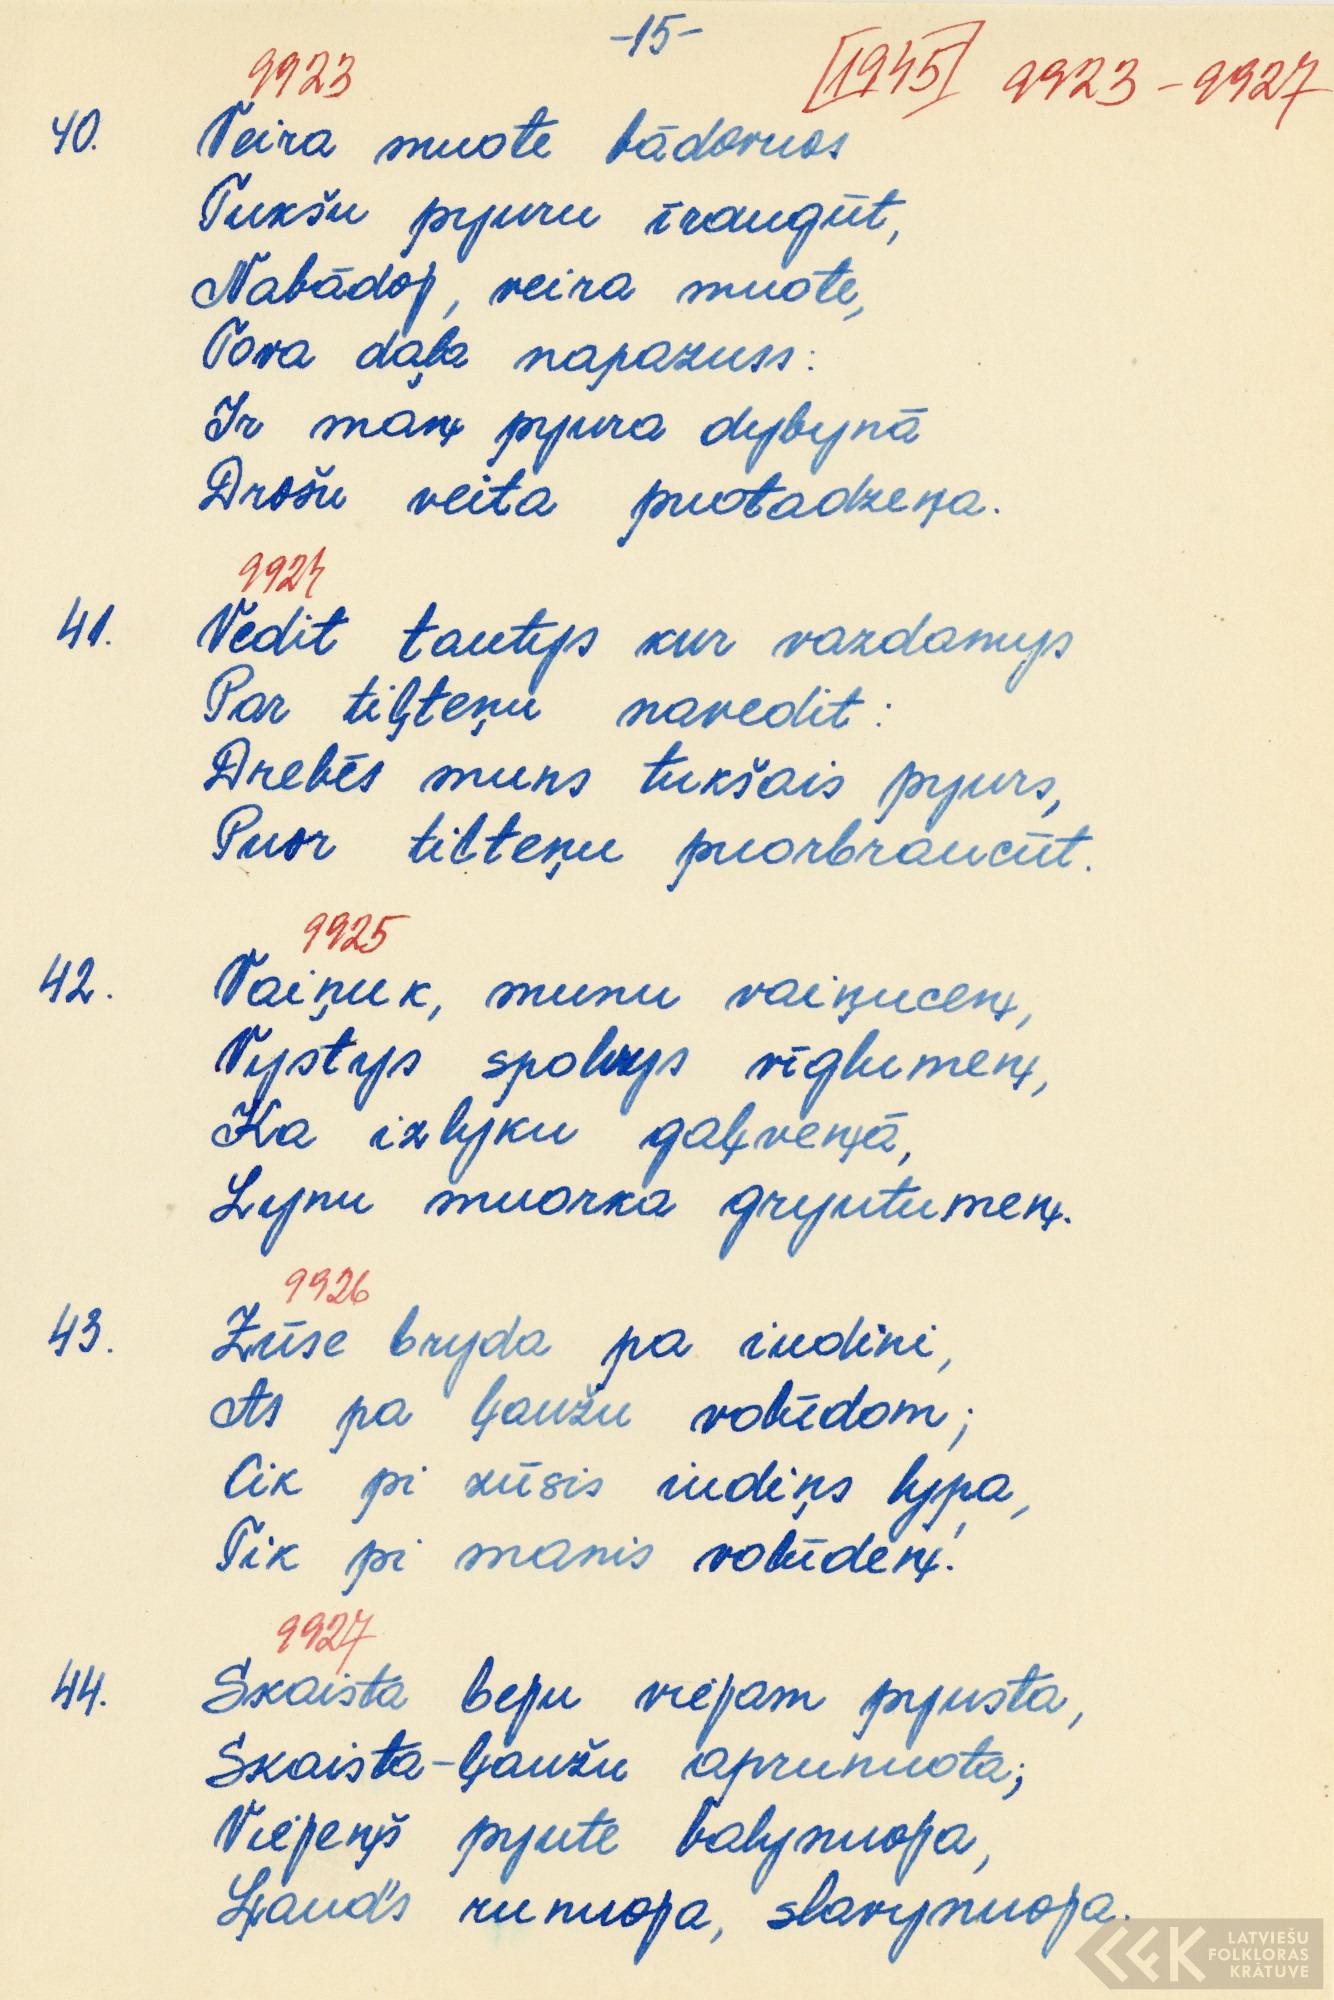 1945-13-zinatniska-ekspedicija-19-0017